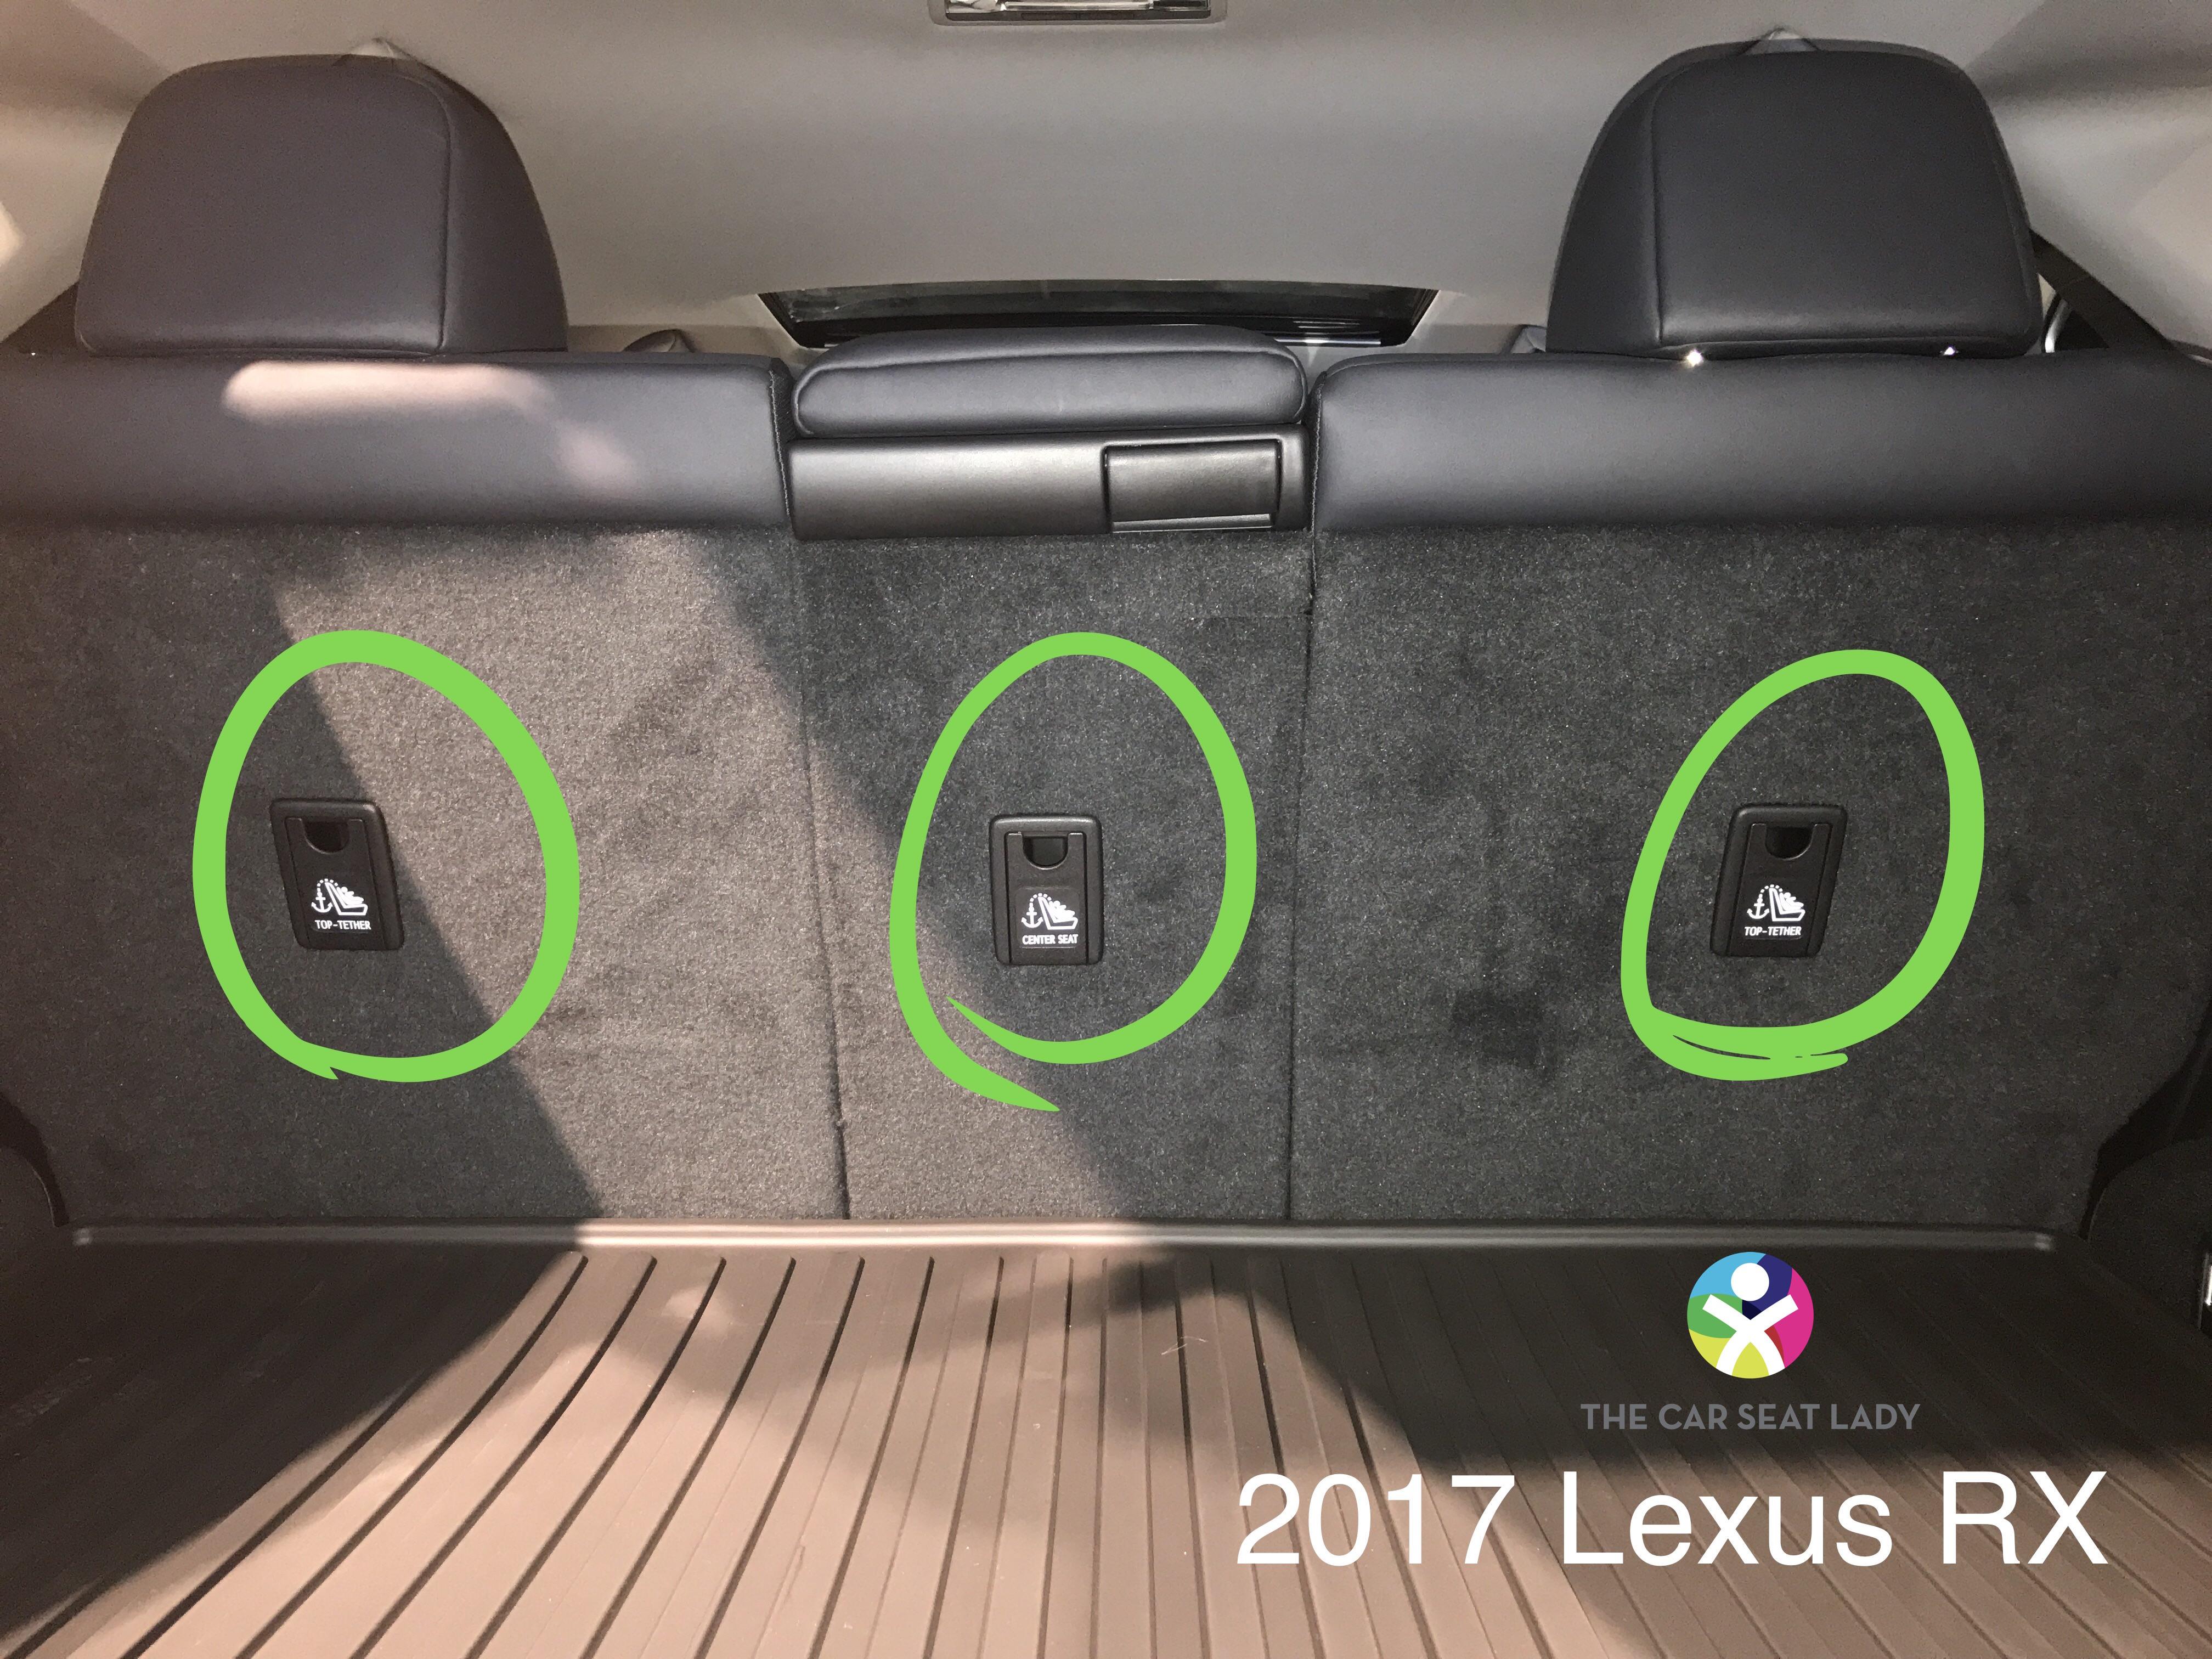 2004 2017 Lexus Rx